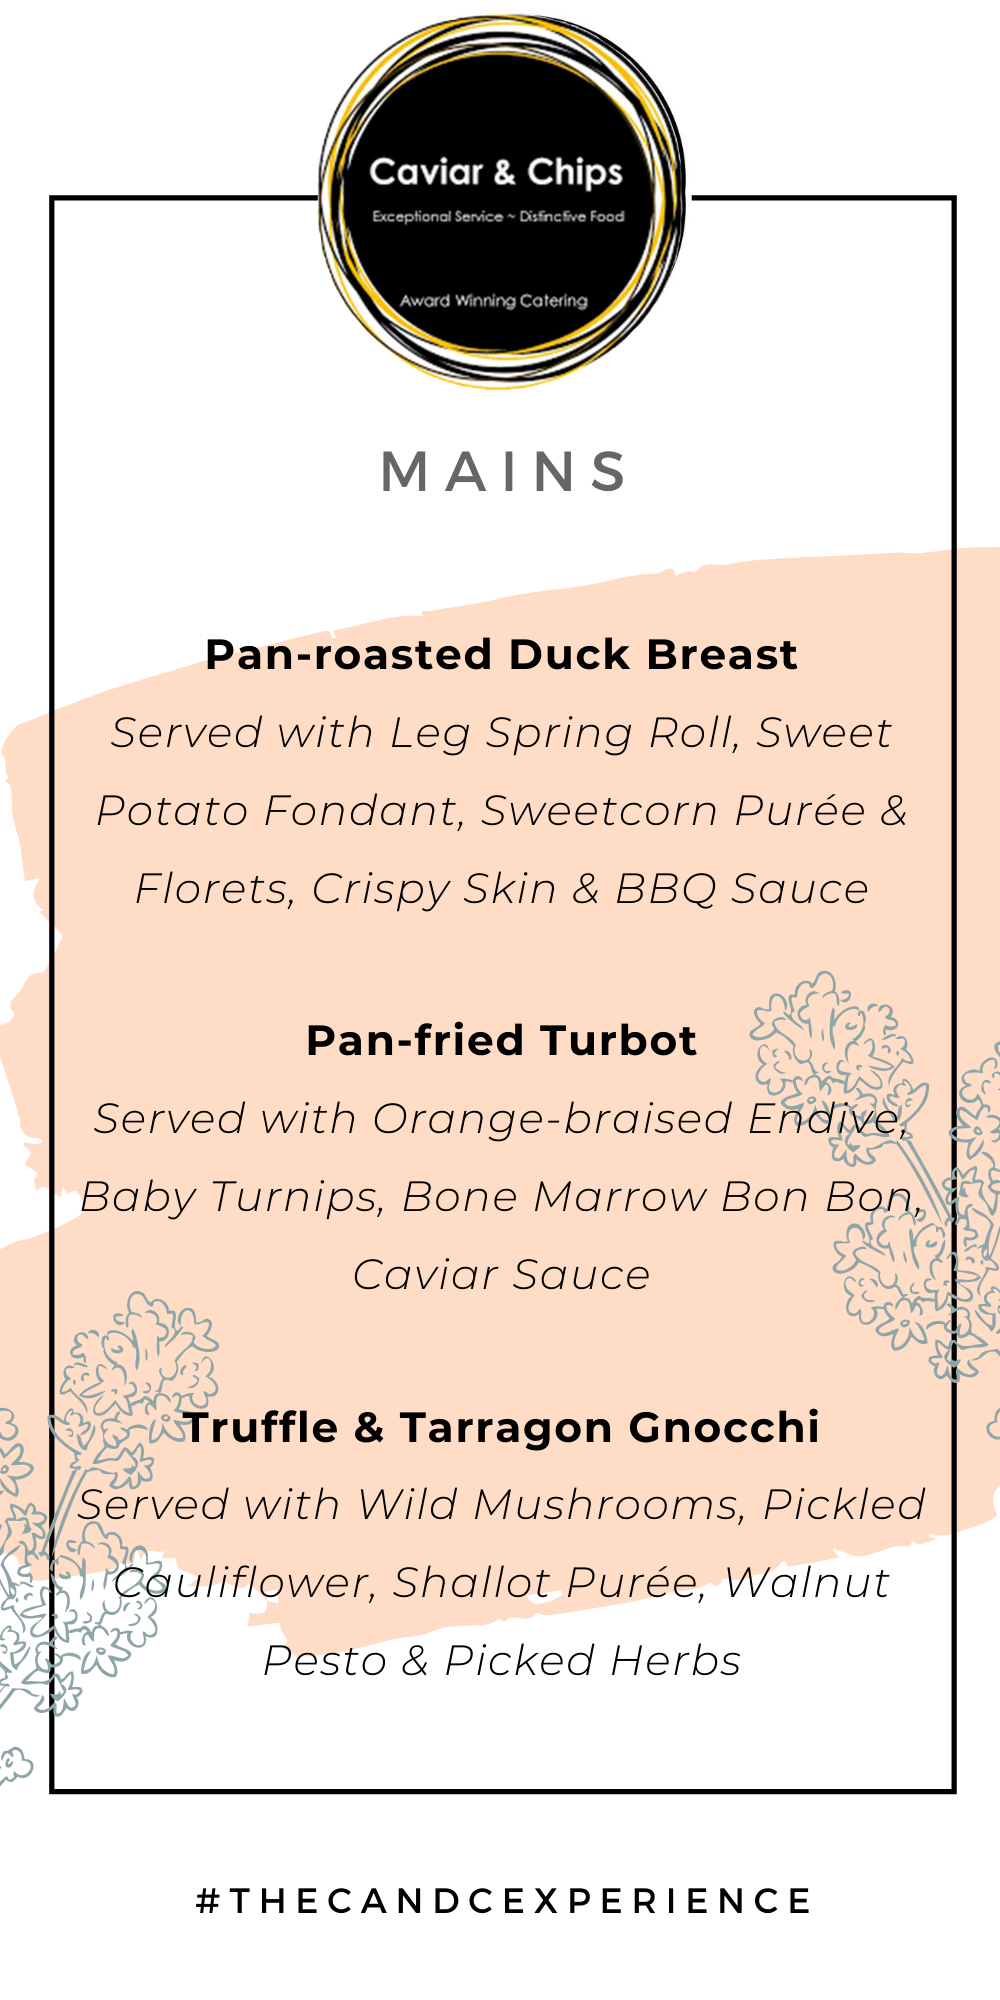 Main course ideas for a autumn inspired wedding menu